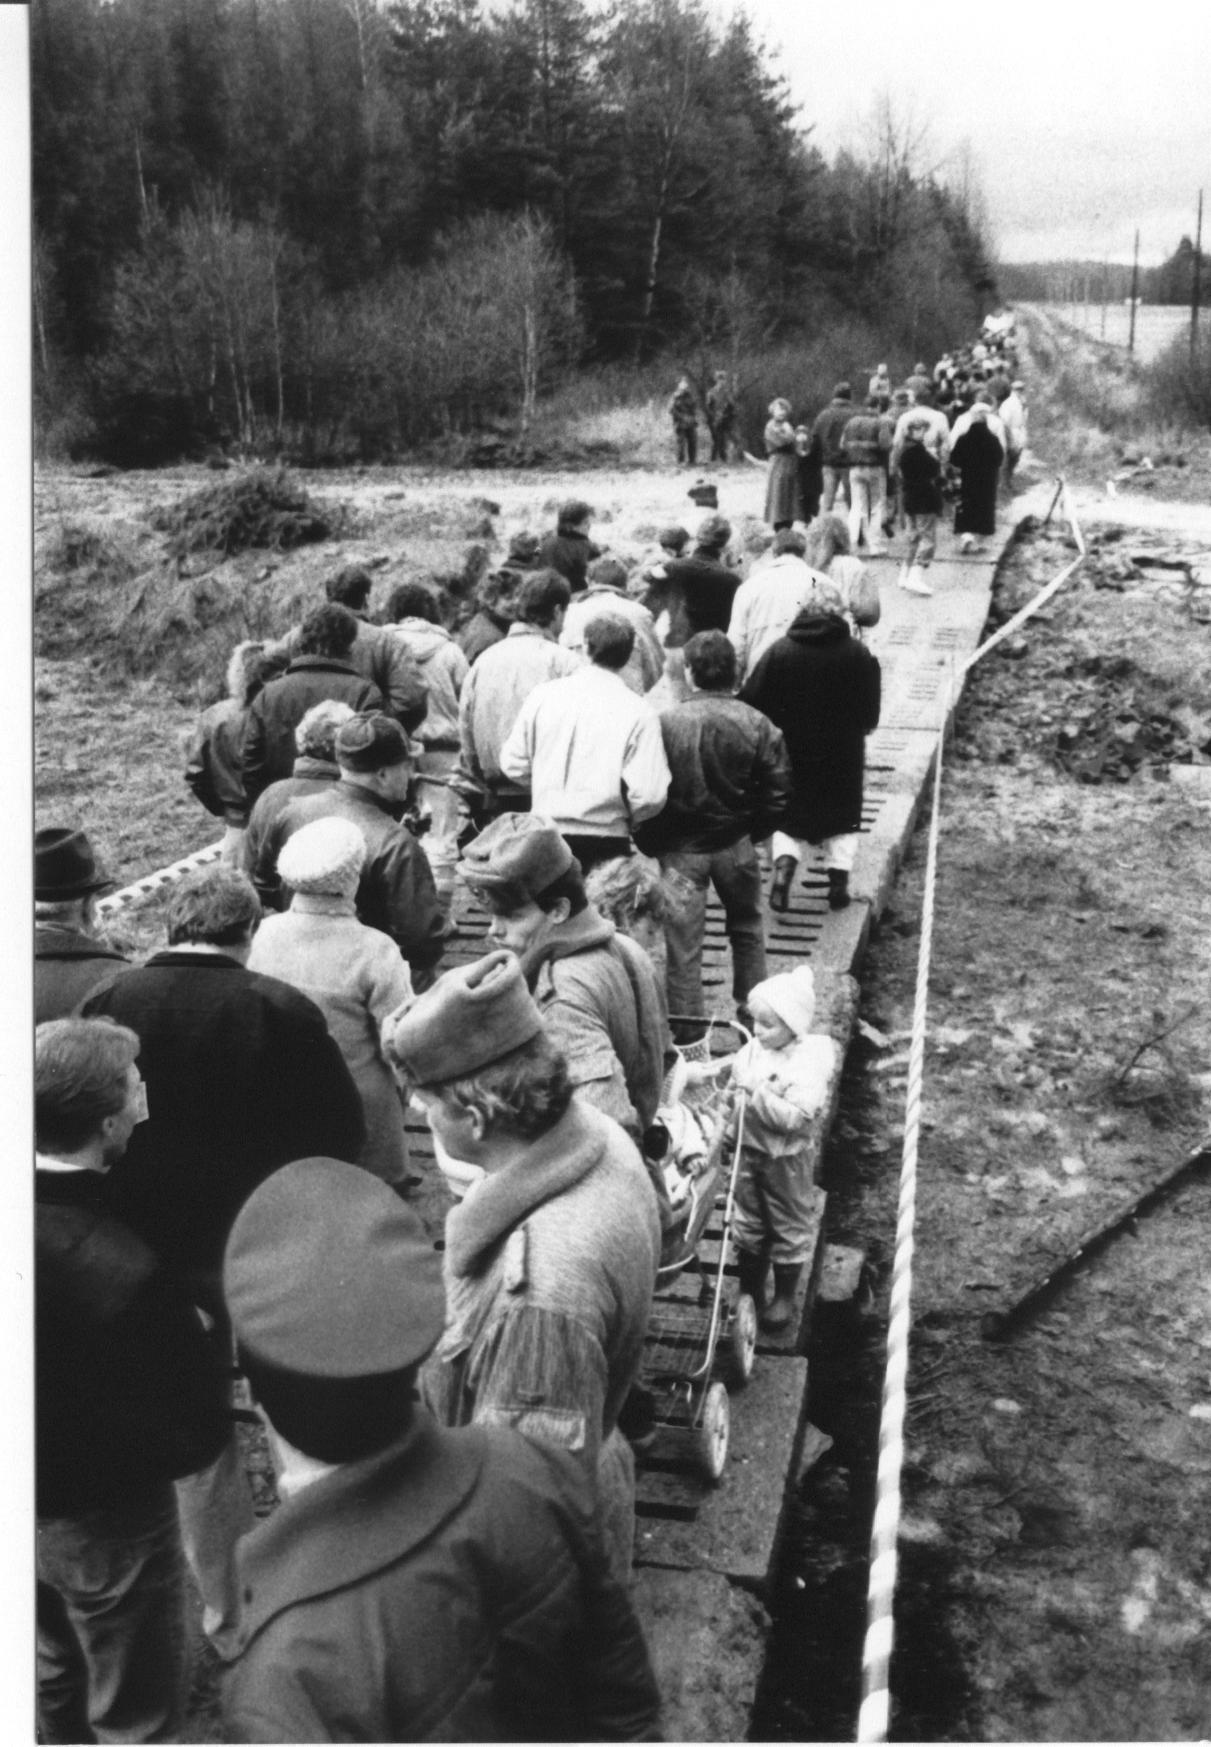 Grenzöffnung Filke/Helmershausen